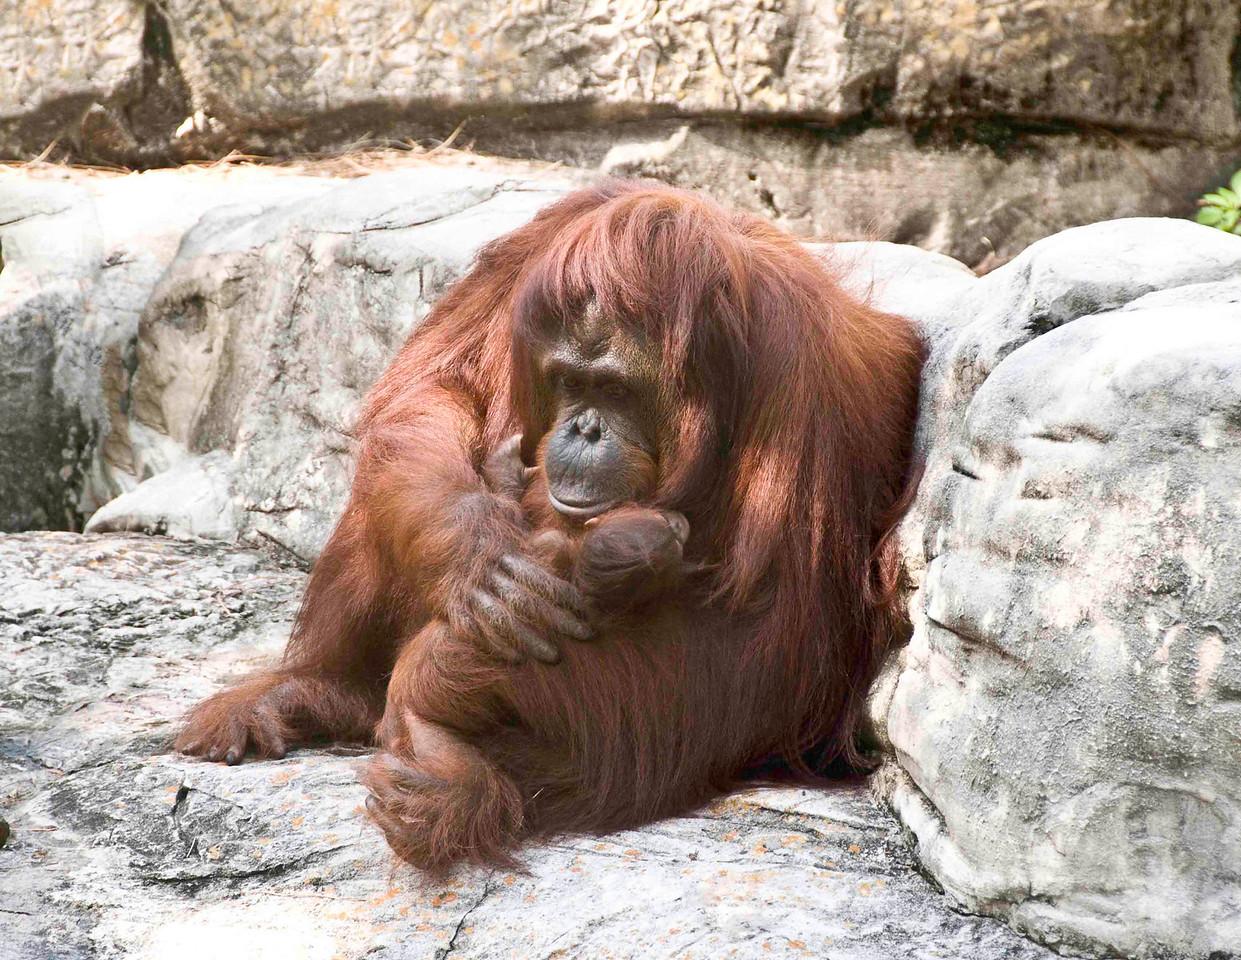 OrangutanMom